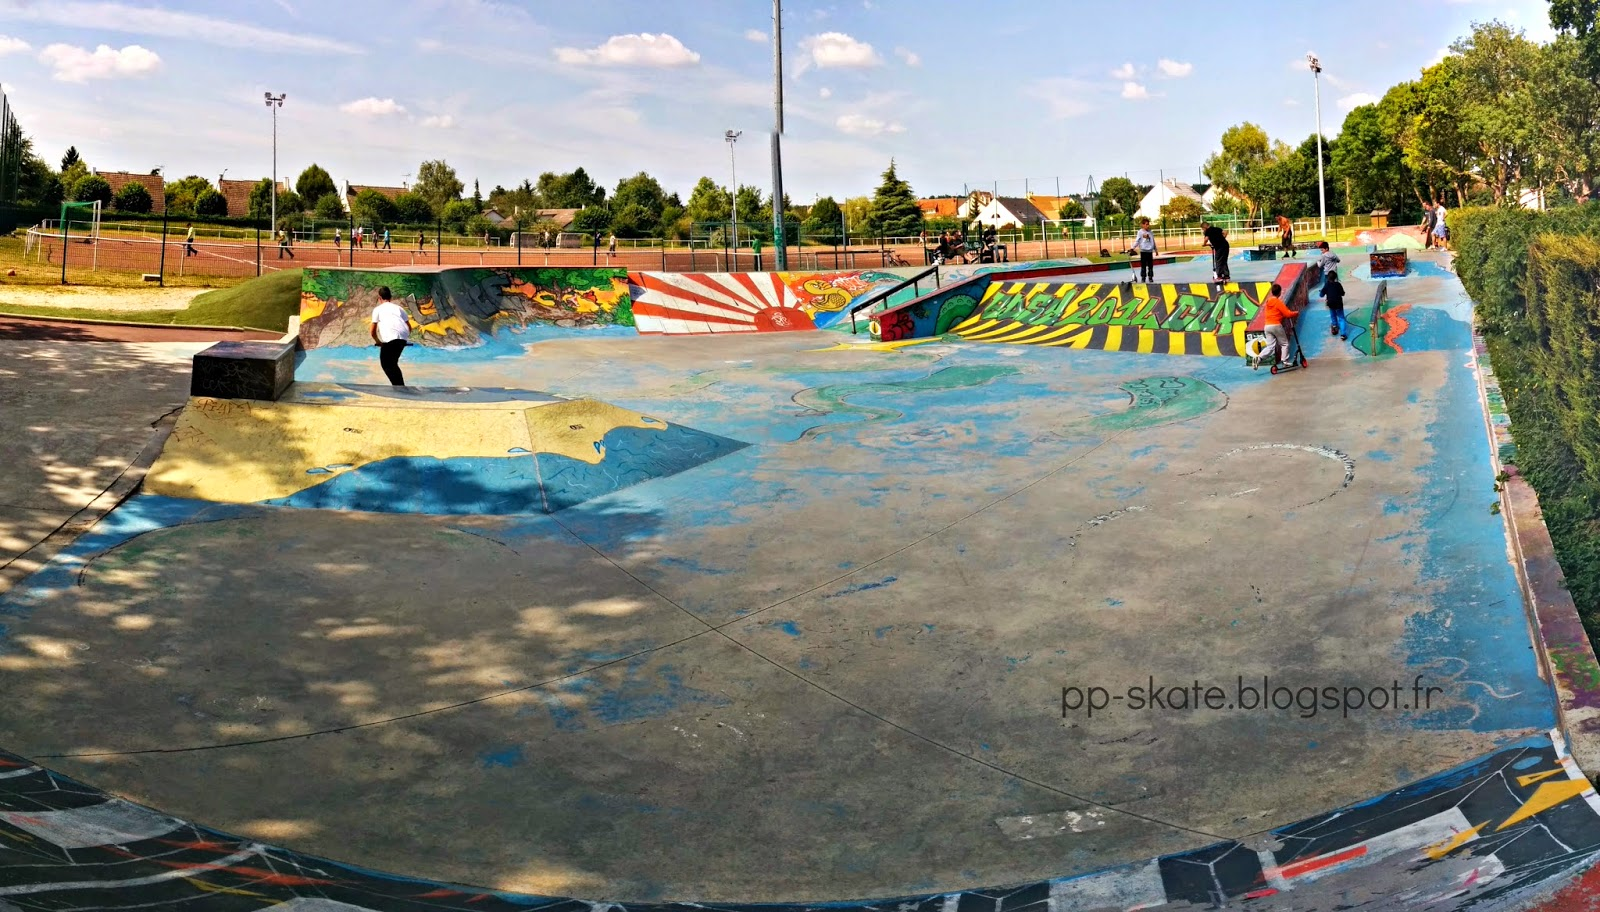 Skatepark Pontault